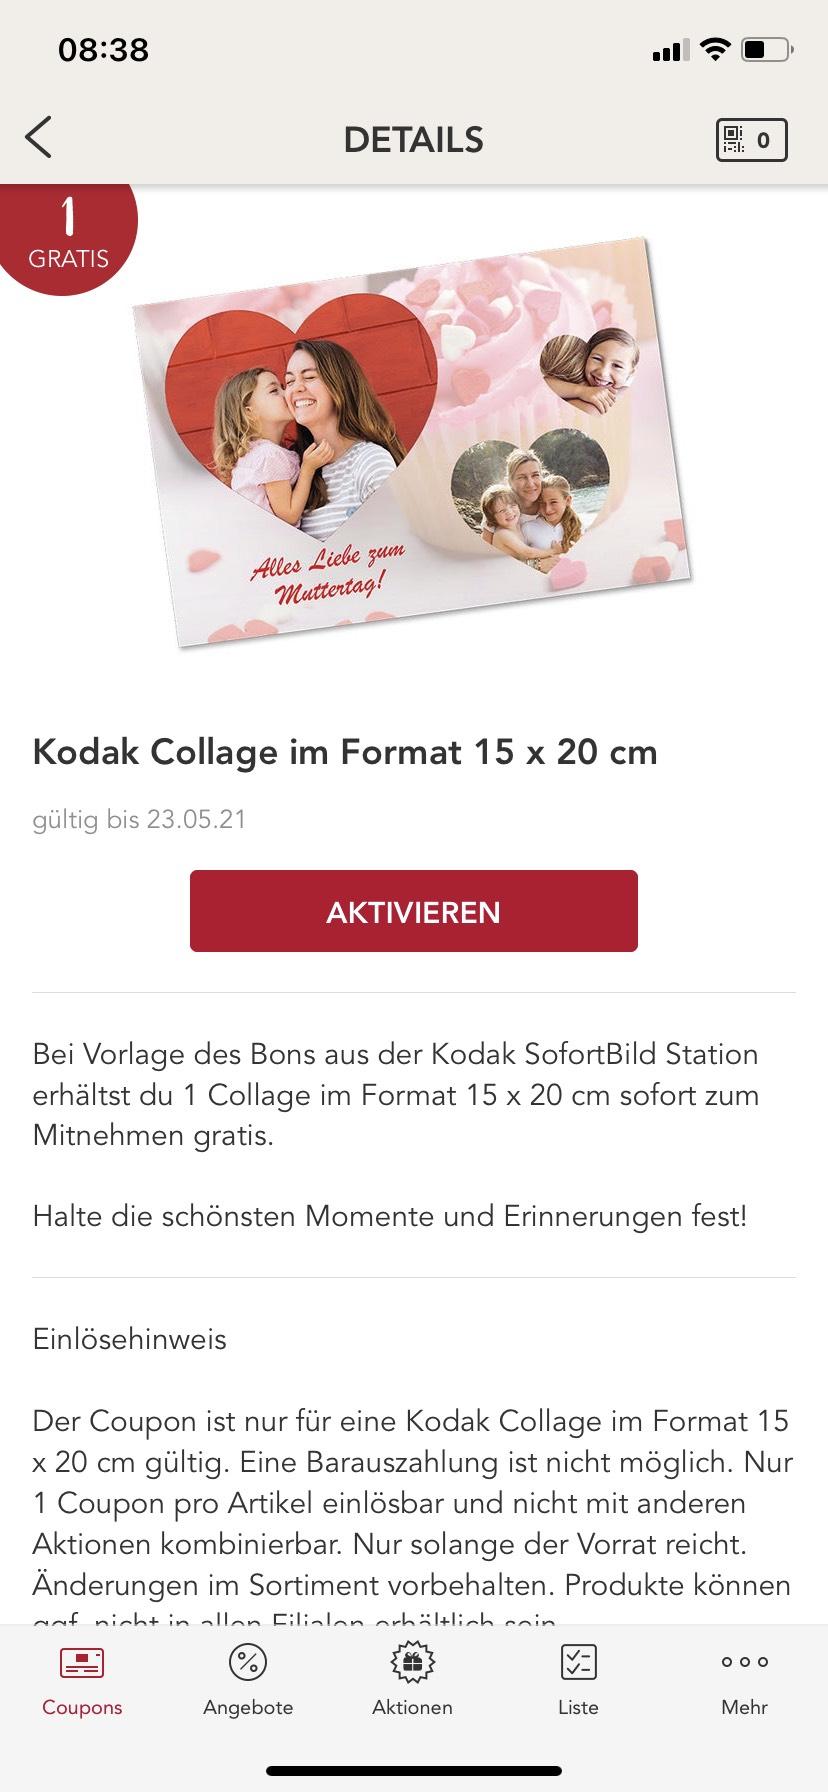 (Personalisiert?) Freebie Kodak Collage 15x20 cm